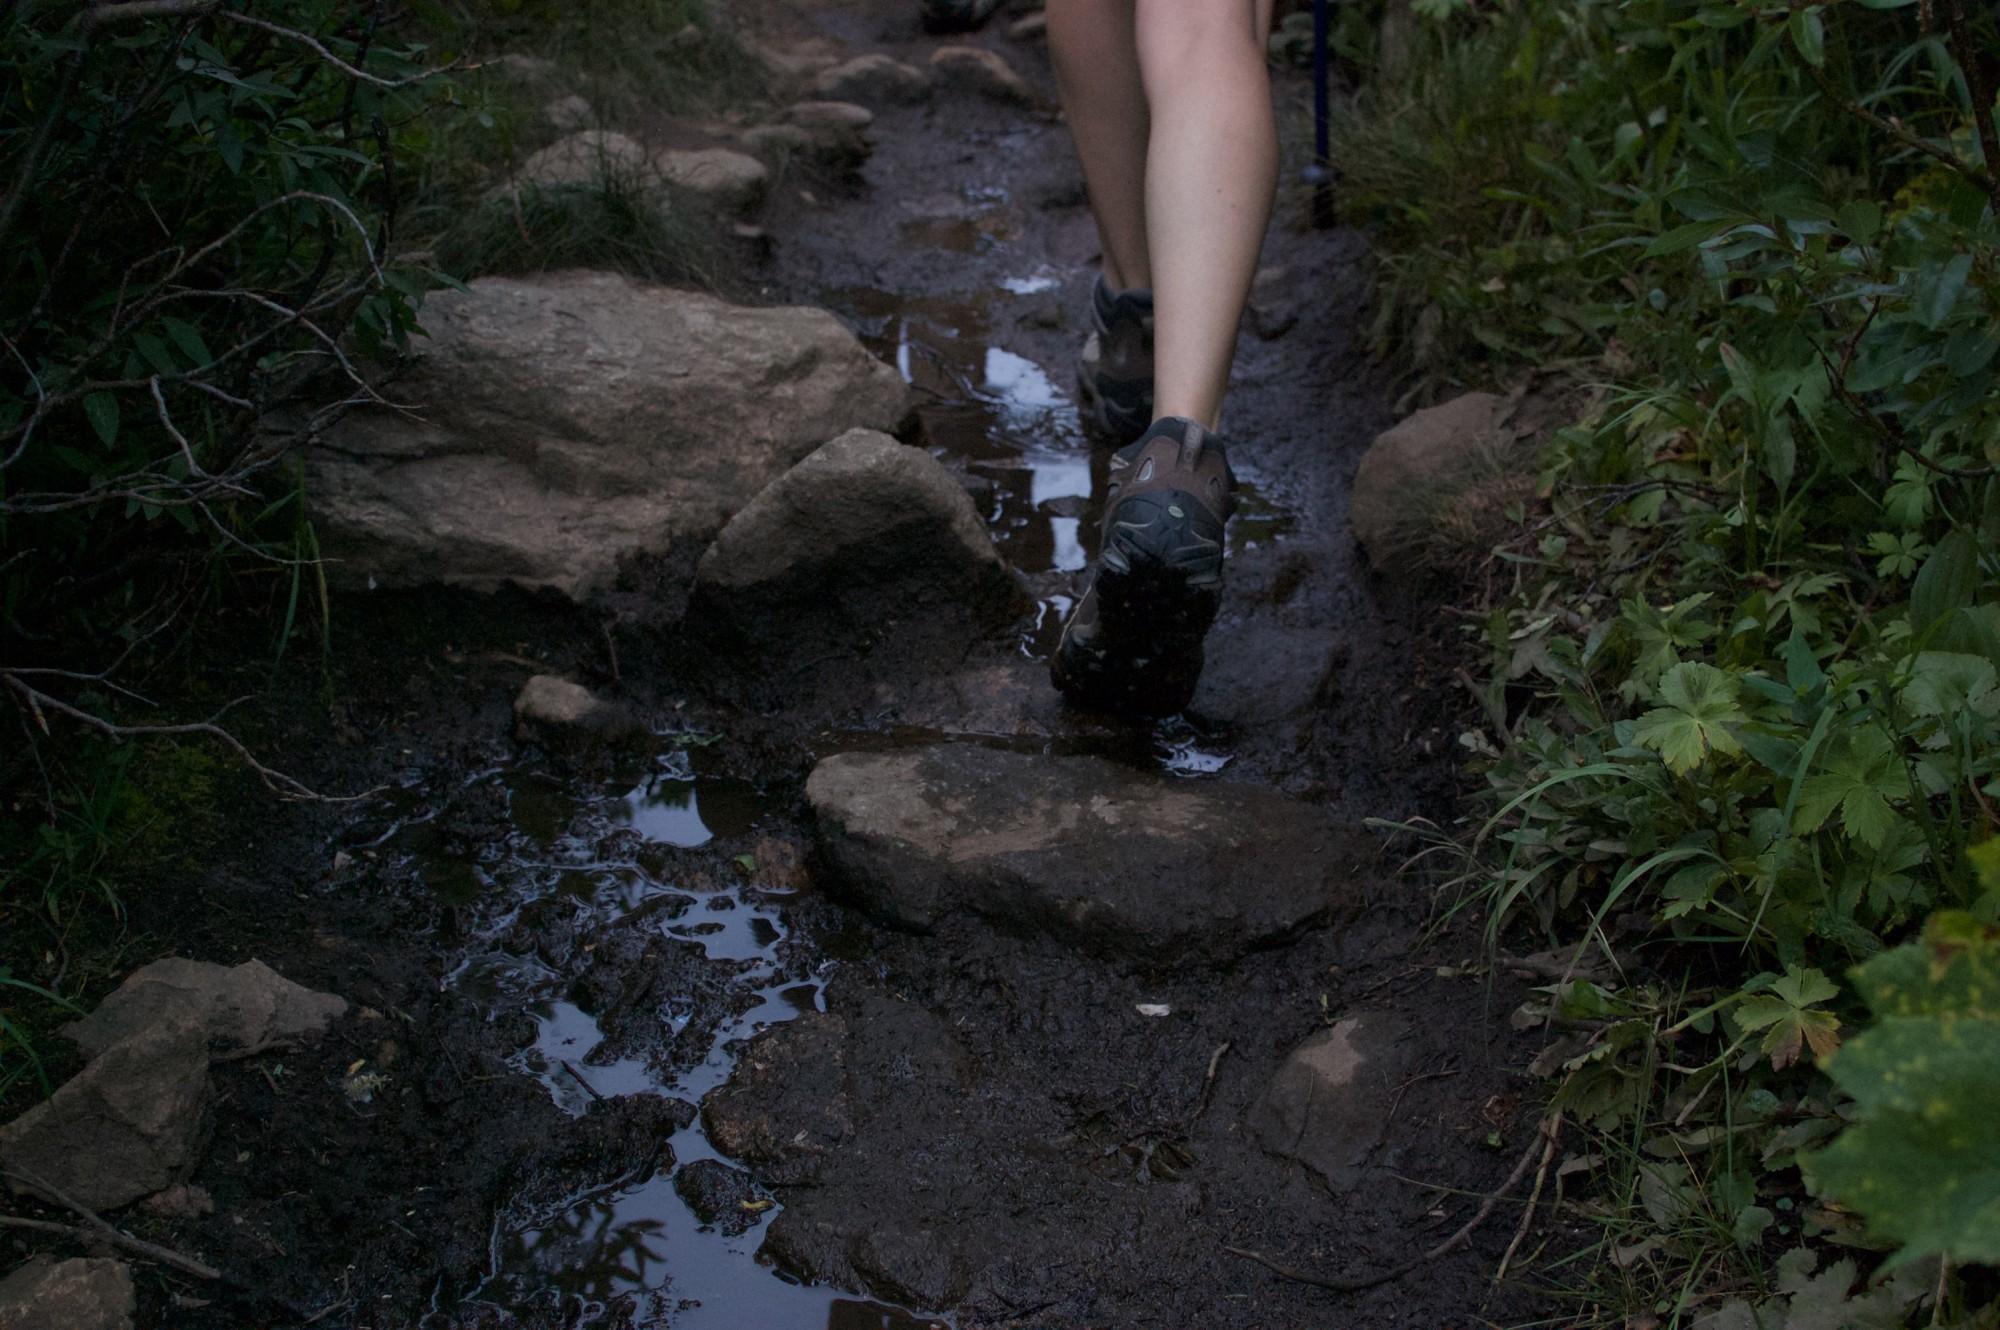 Walking on a trail